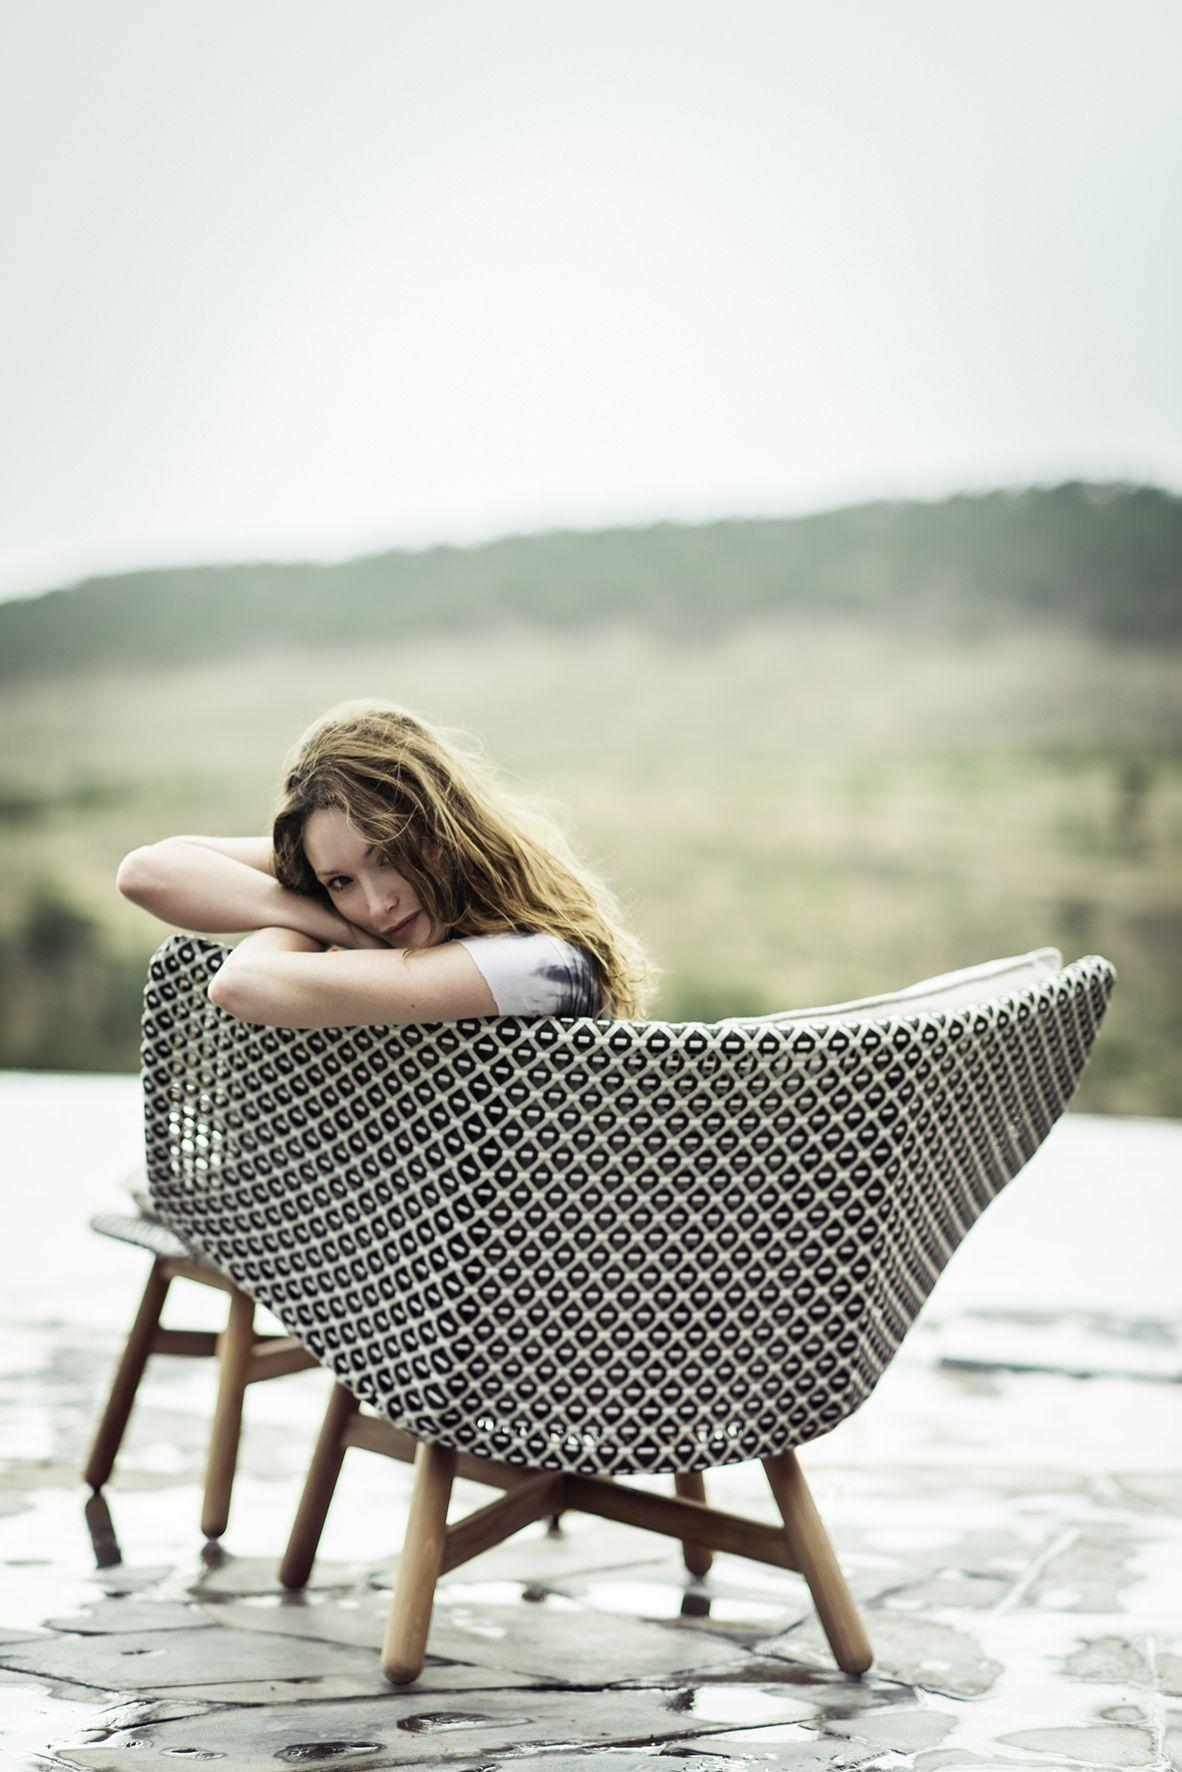 MBRACE Garden armchair Mbrace Collection by Dedon design Sebastian